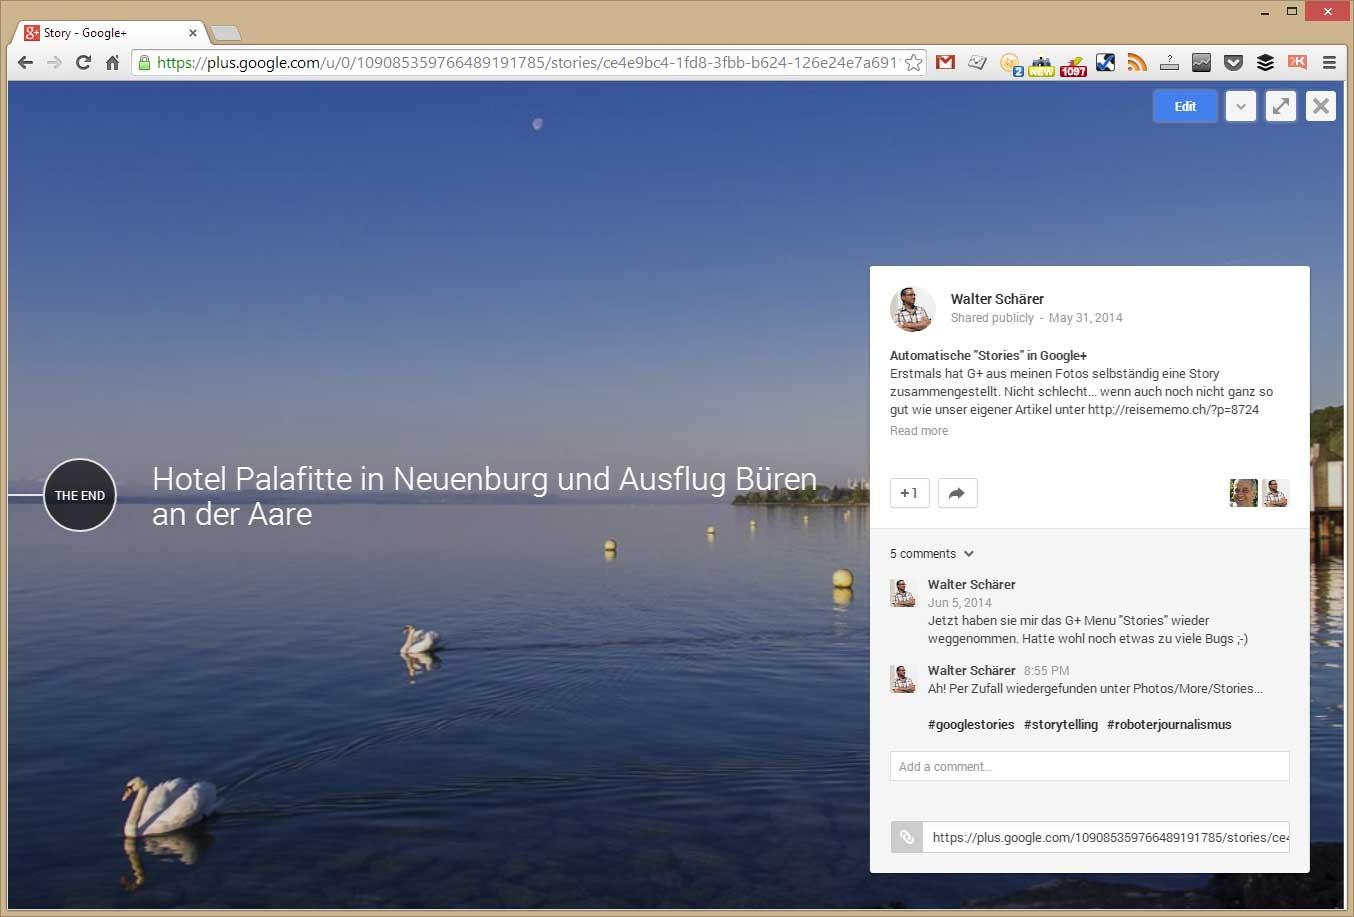 Publizieren der Google Story via Google+